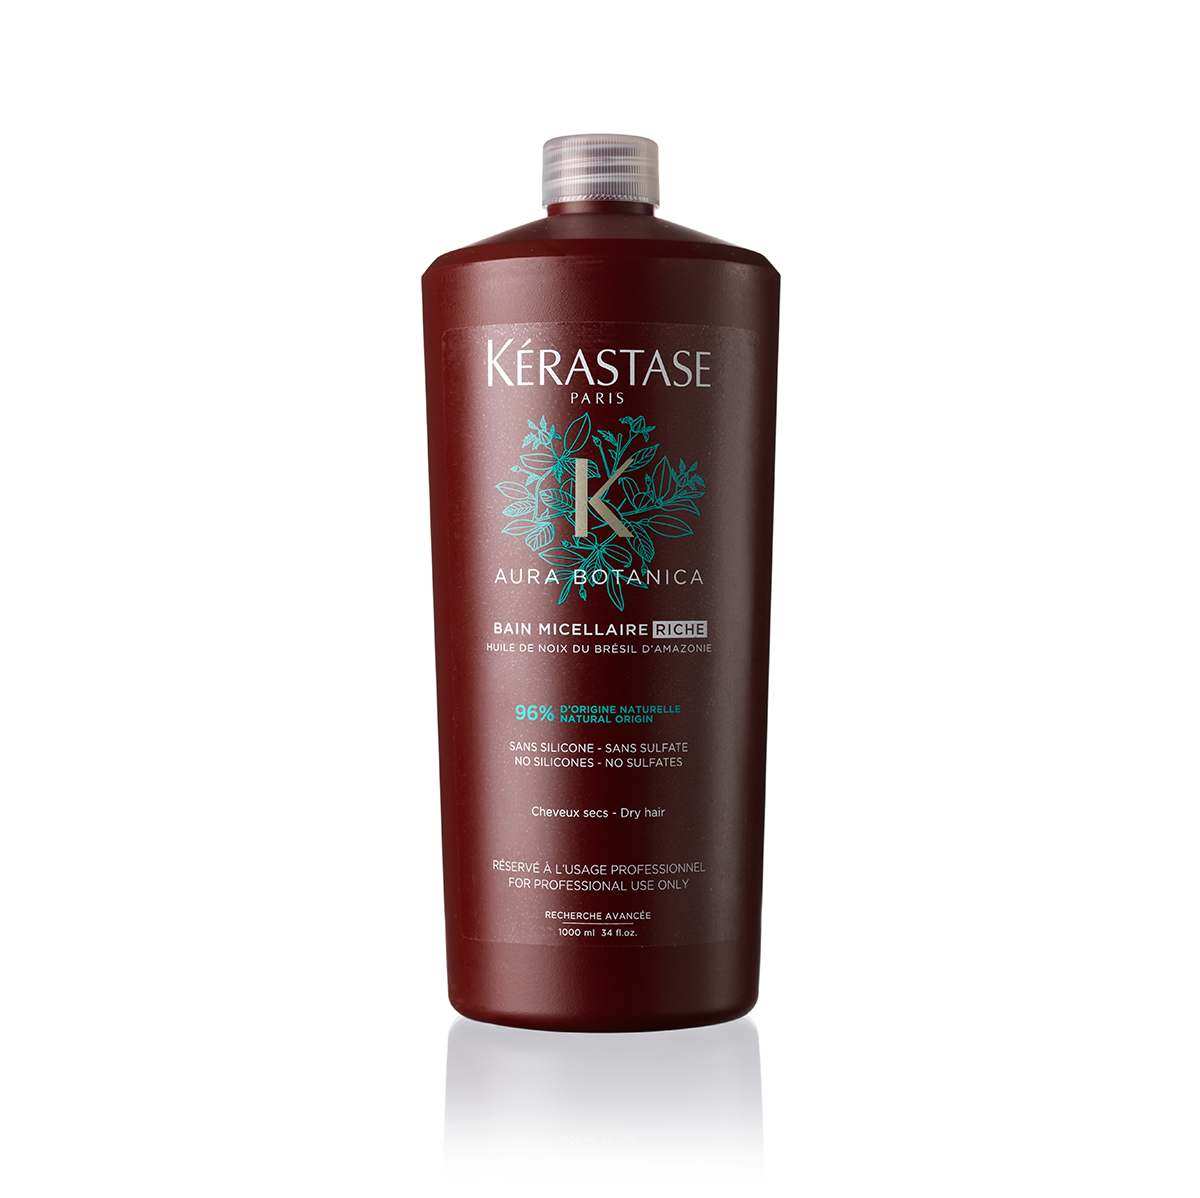 Billede af Kérastase Aura Botanica Riche Shampoo - 1000 ml